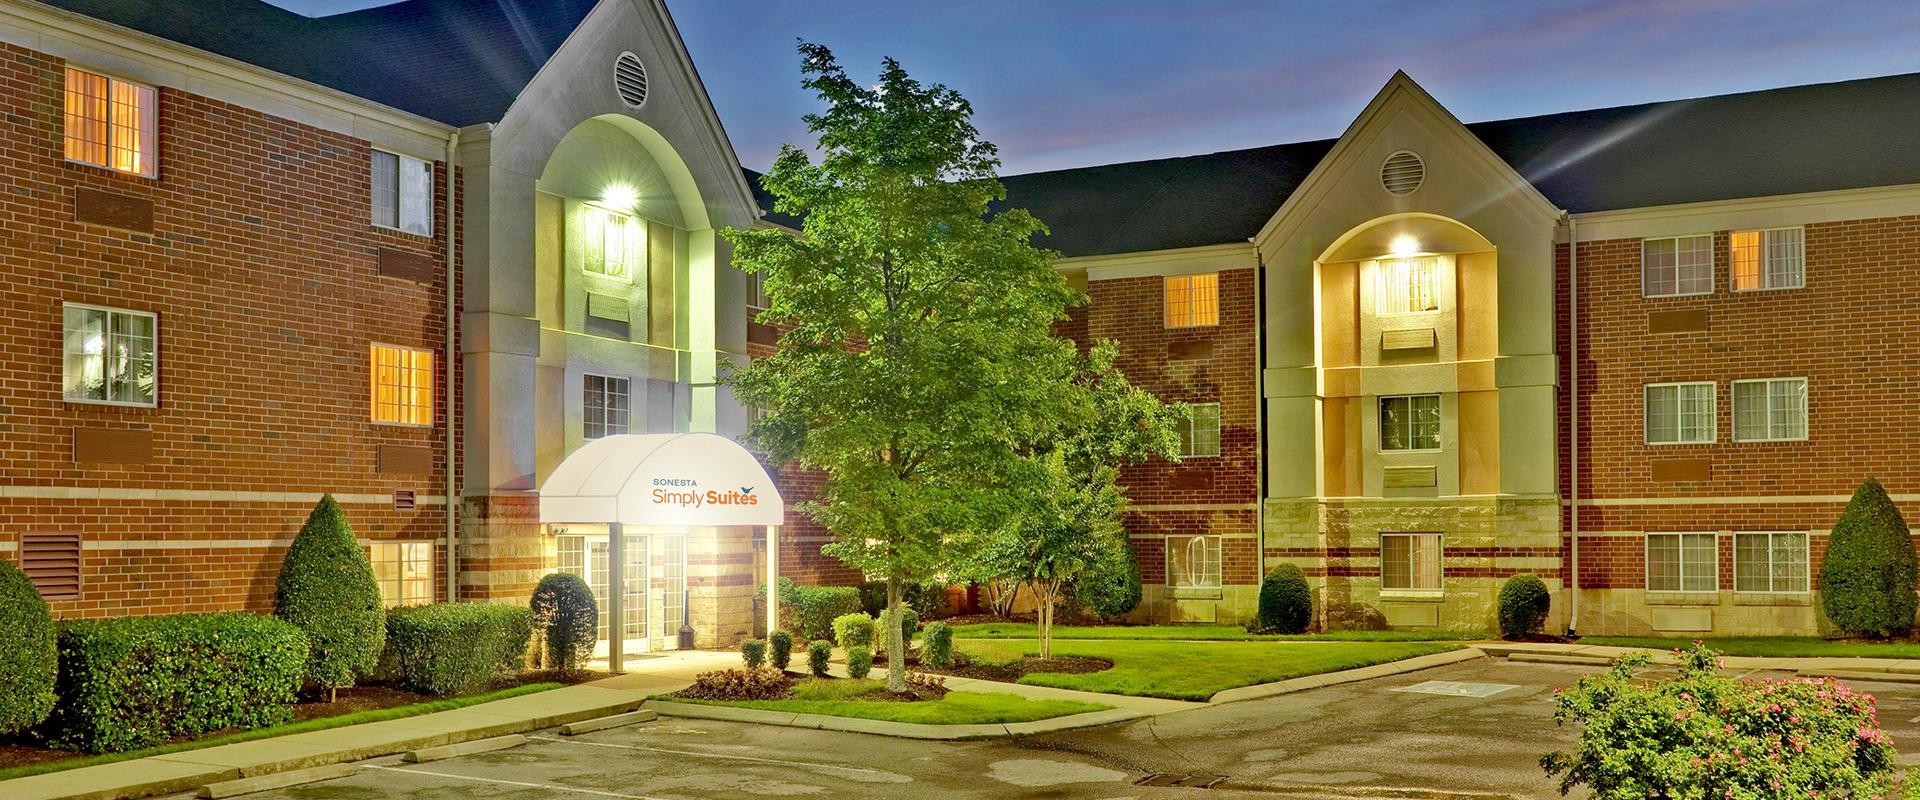 Sonesta Simply Suites Nashville Brentwood Hotel Exterior Entrance